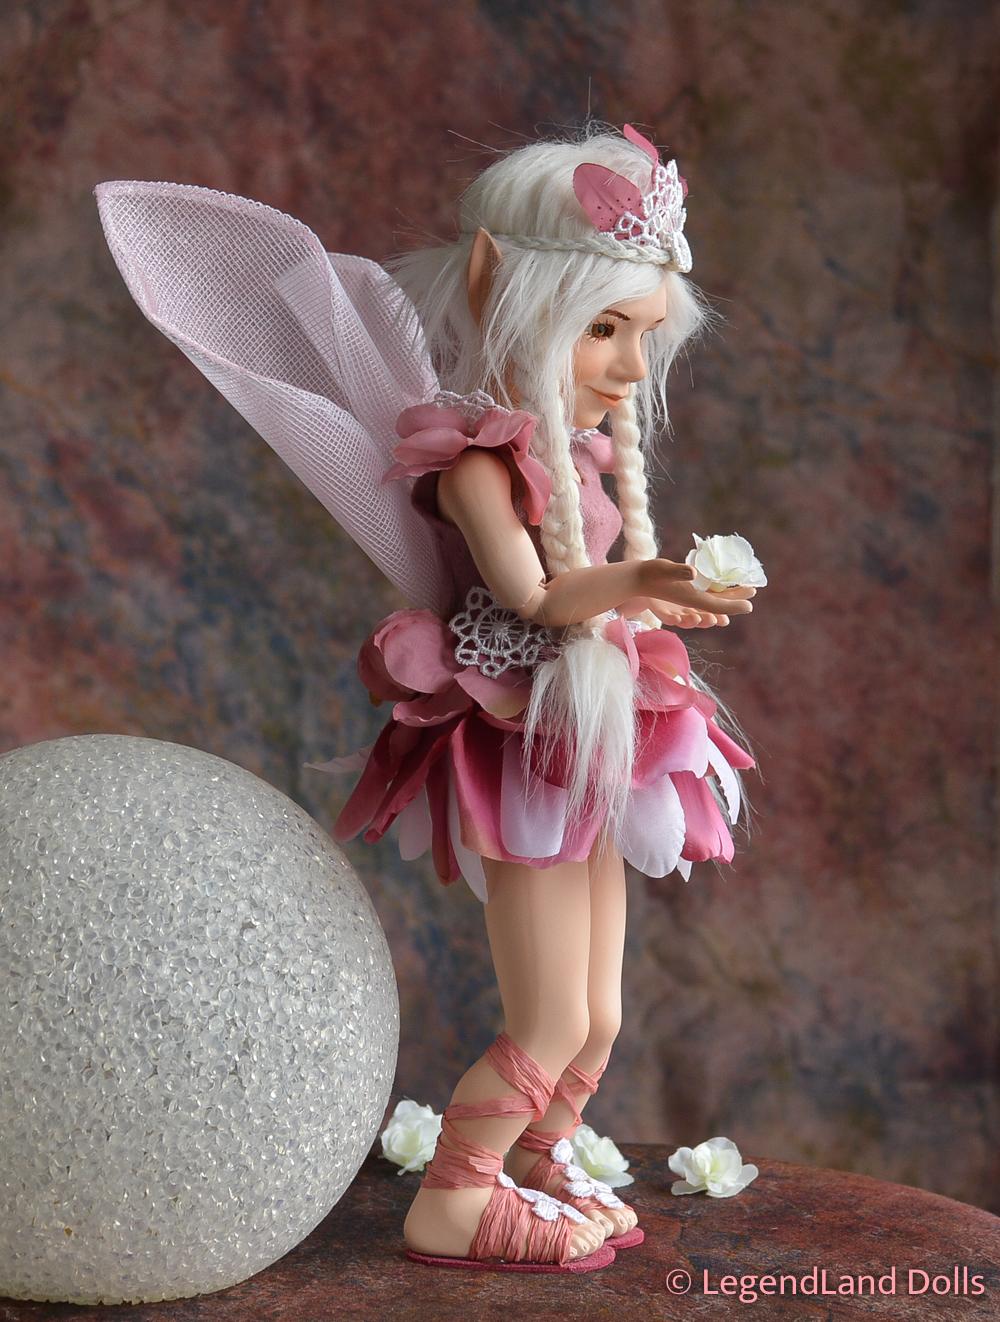 Tündér figura - Lucinda a remény tündére | LegendLand Dolls